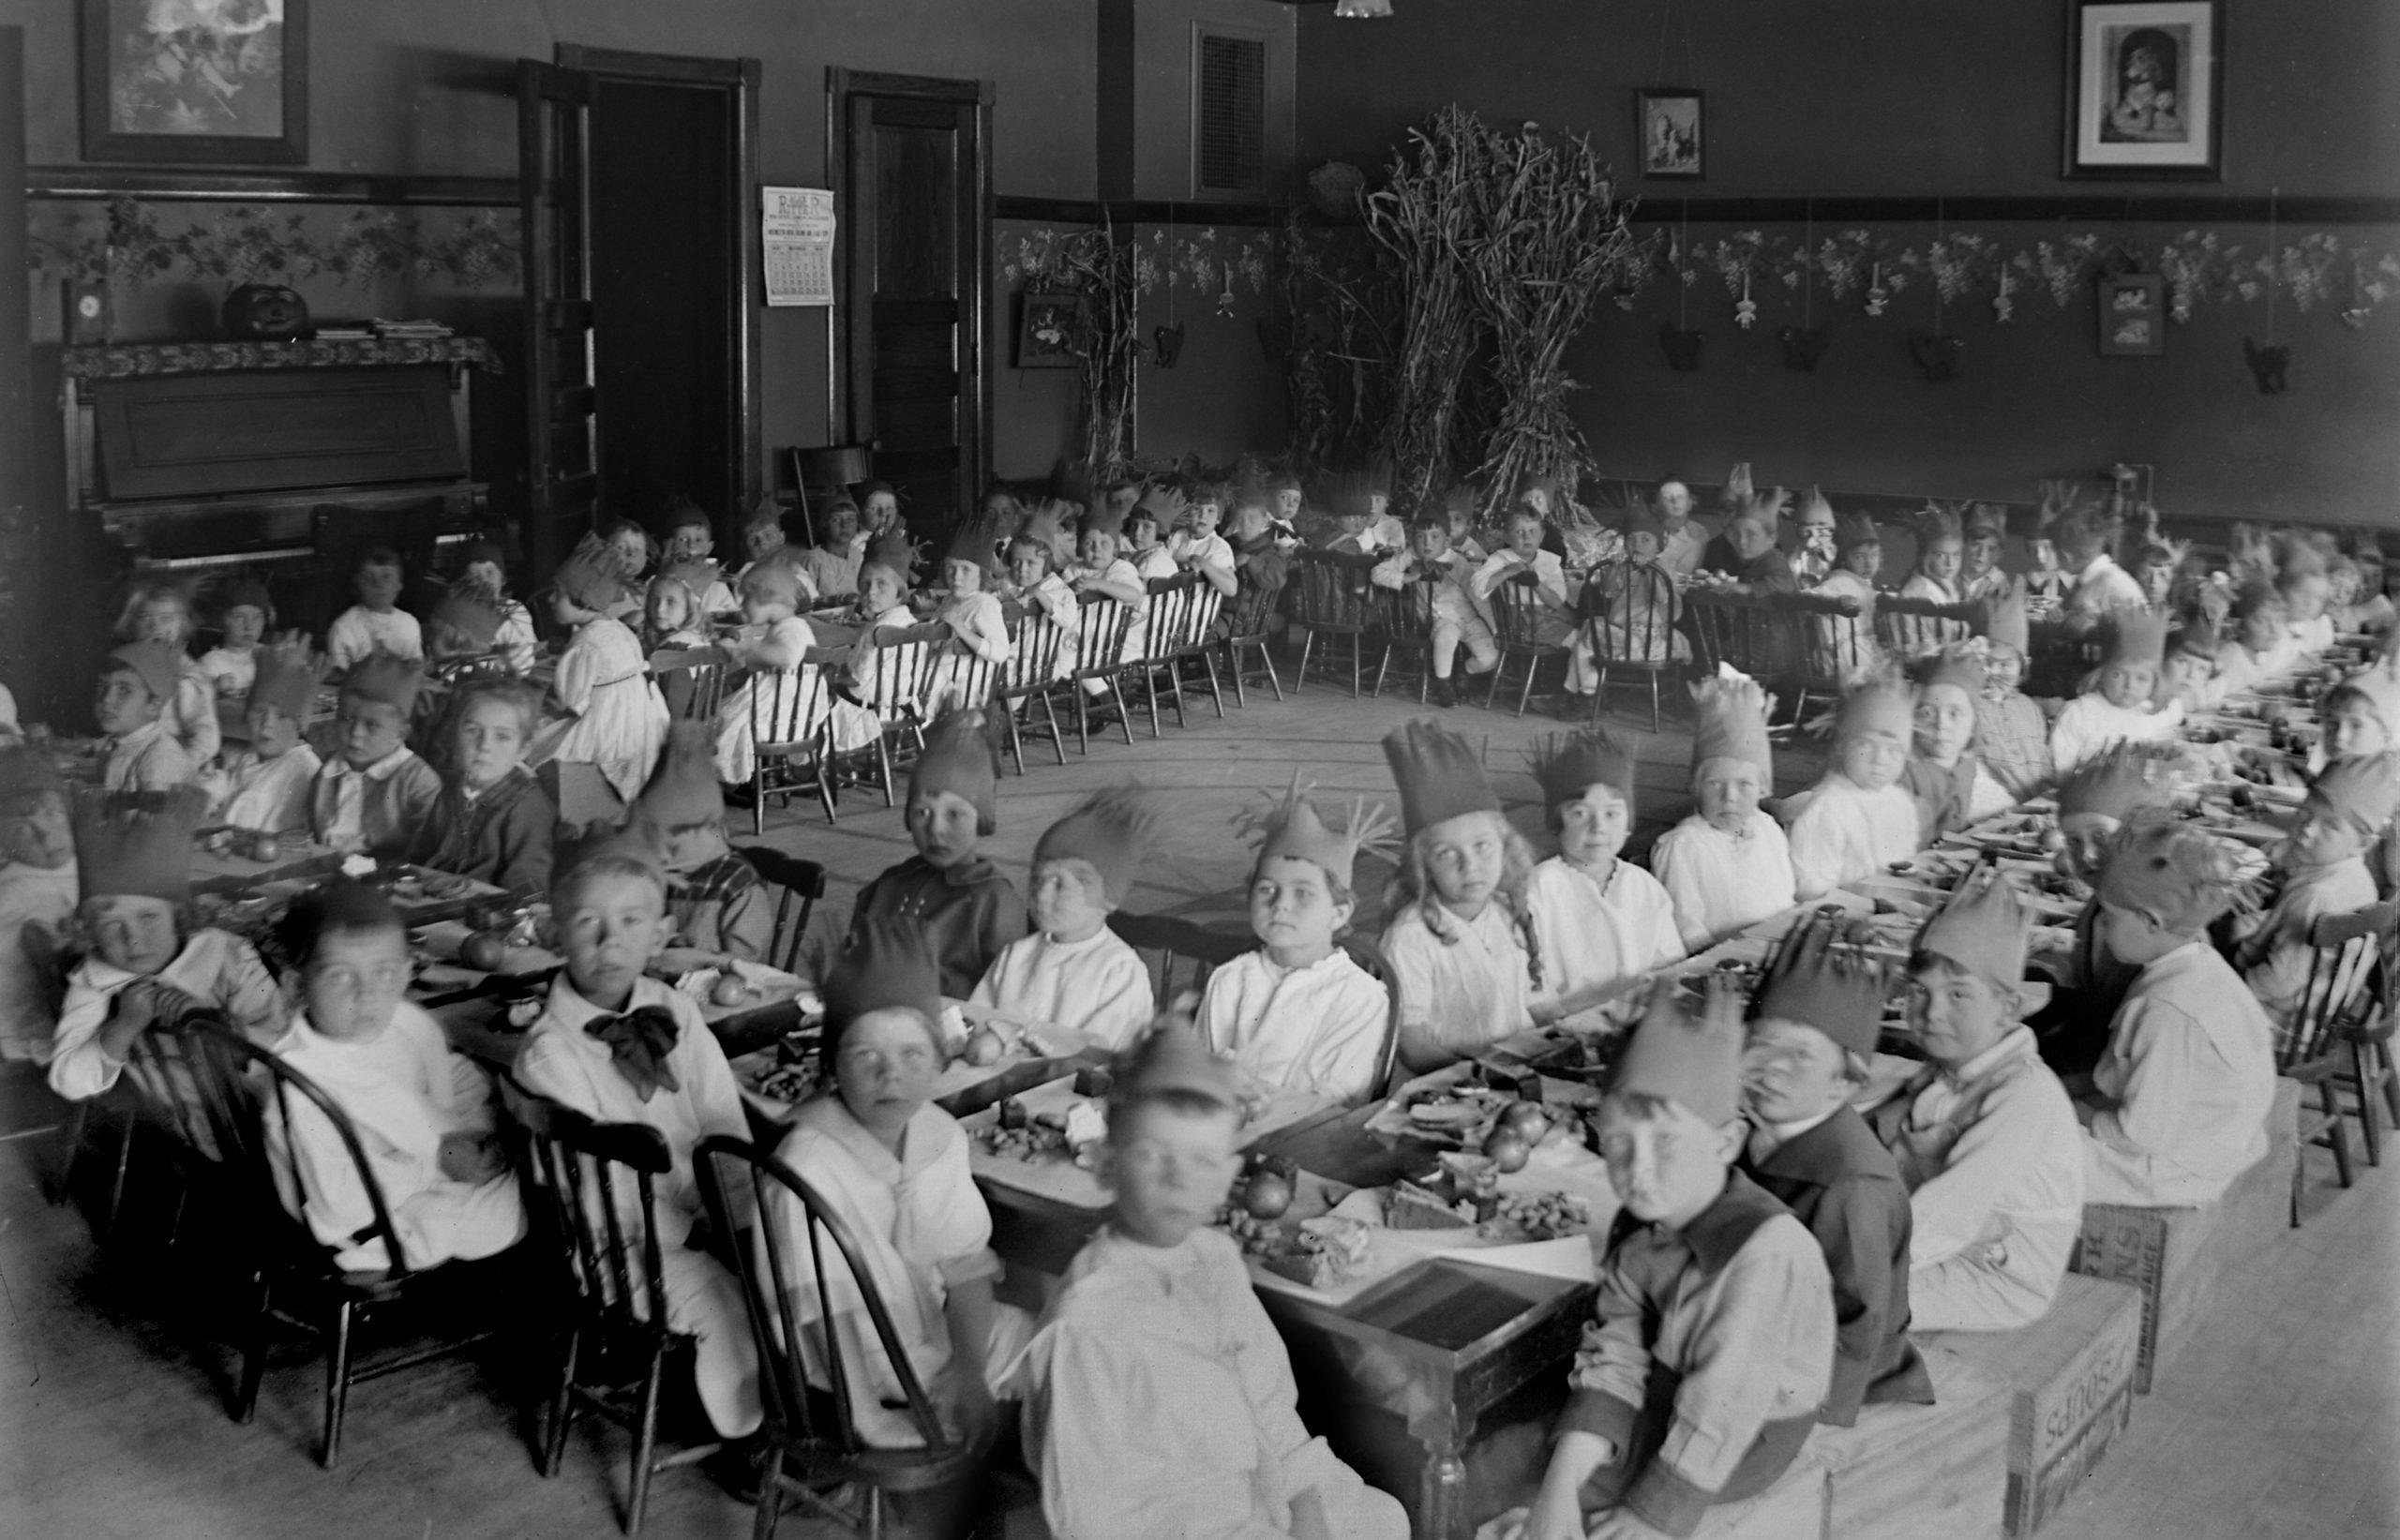 Turkey dinner in the elementary school classroom, ca. 1910.